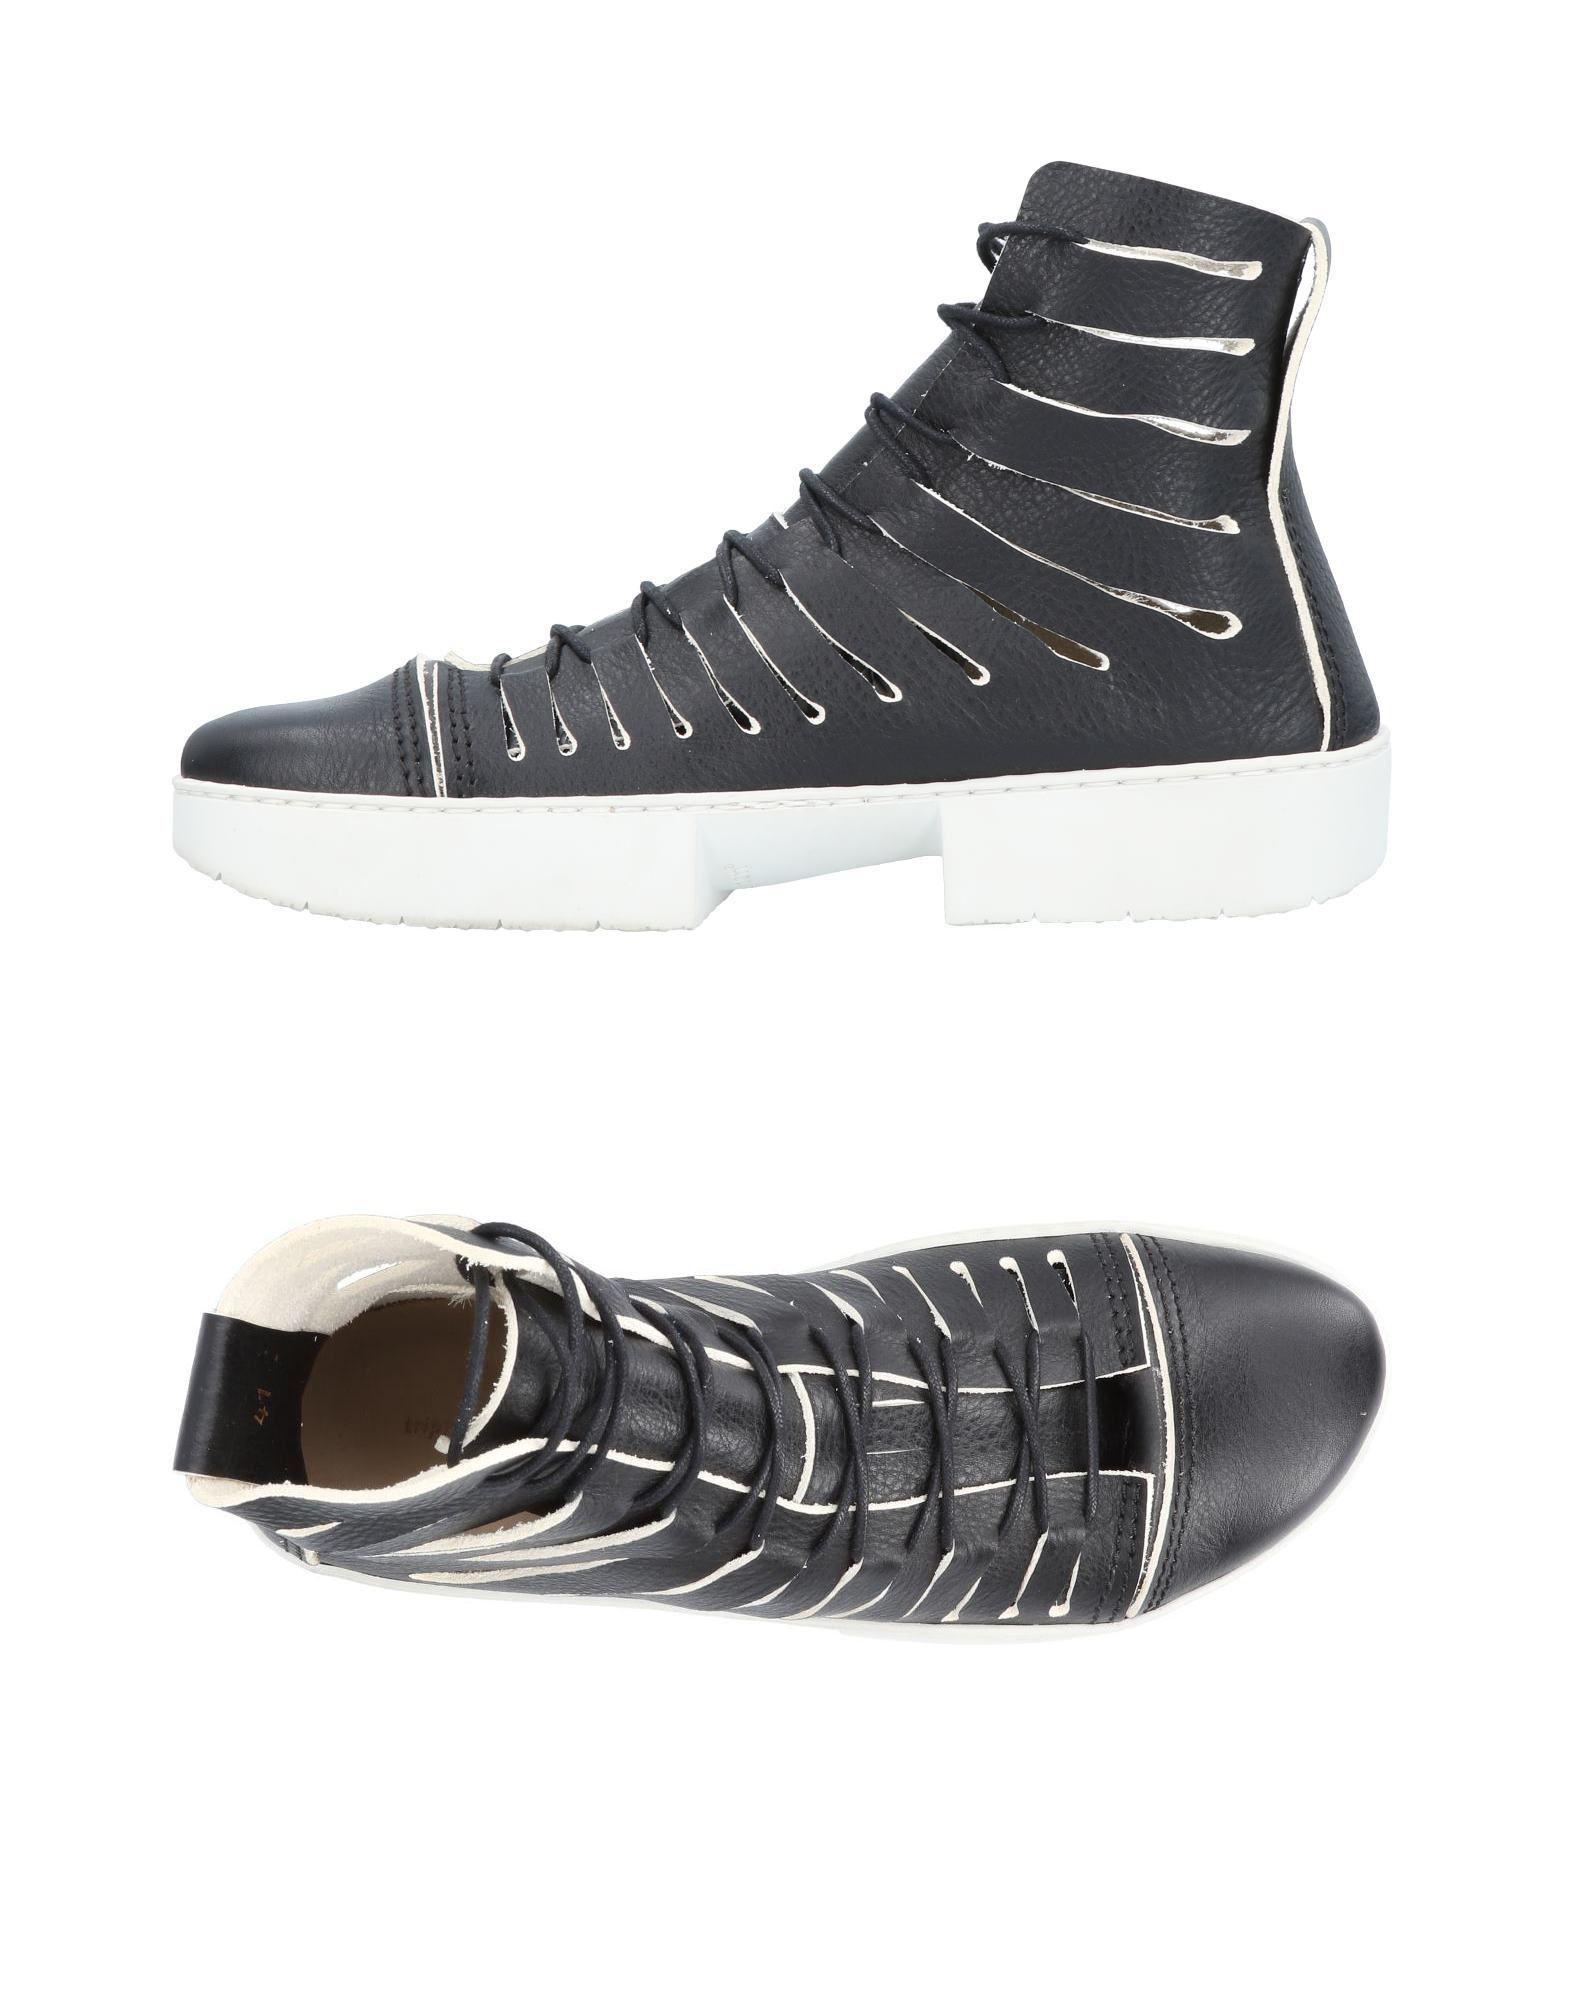 FOOTWEAR - High-tops & sneakers Trippen ofiDY